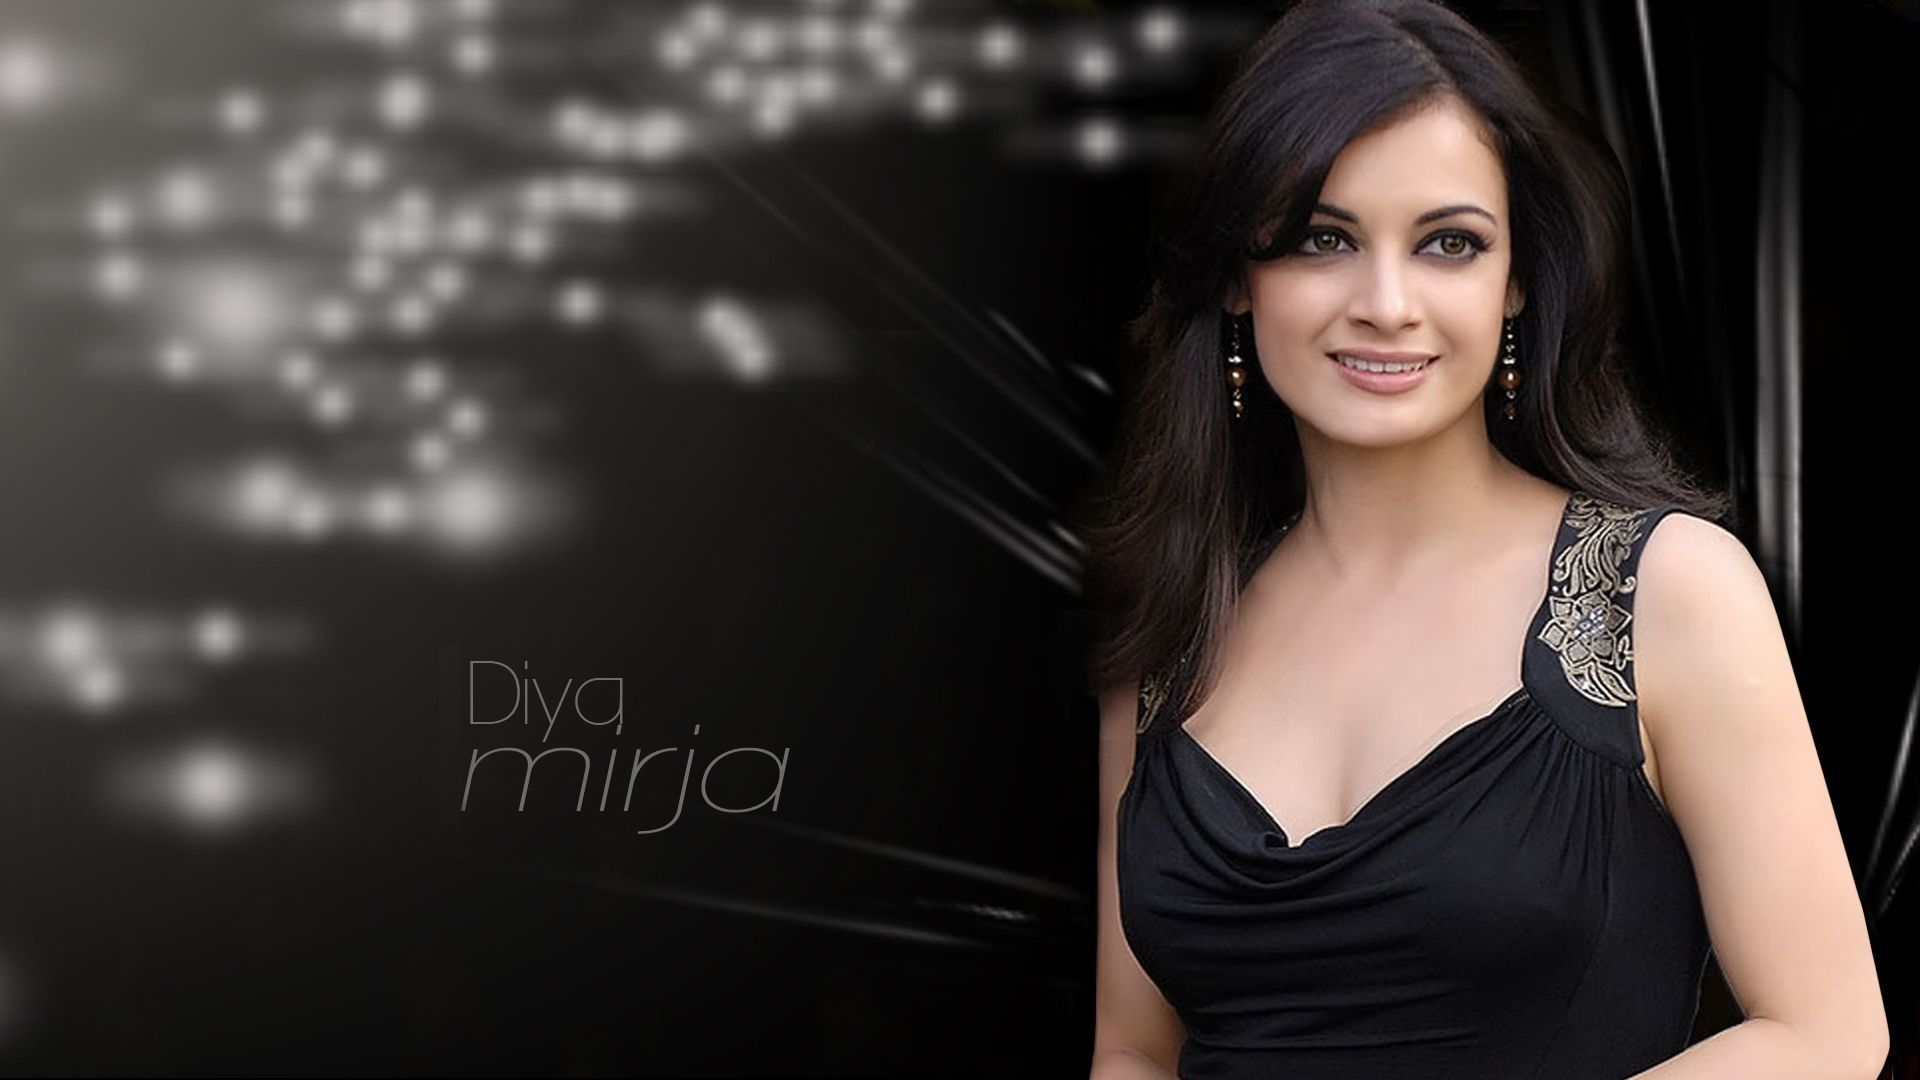 Full Hd Wallpapers Bollywood Actress Wallpaper 1920 1080: 1920x1080 Bollywood Actress Hd Wallpapers 1080p Diya Mirja